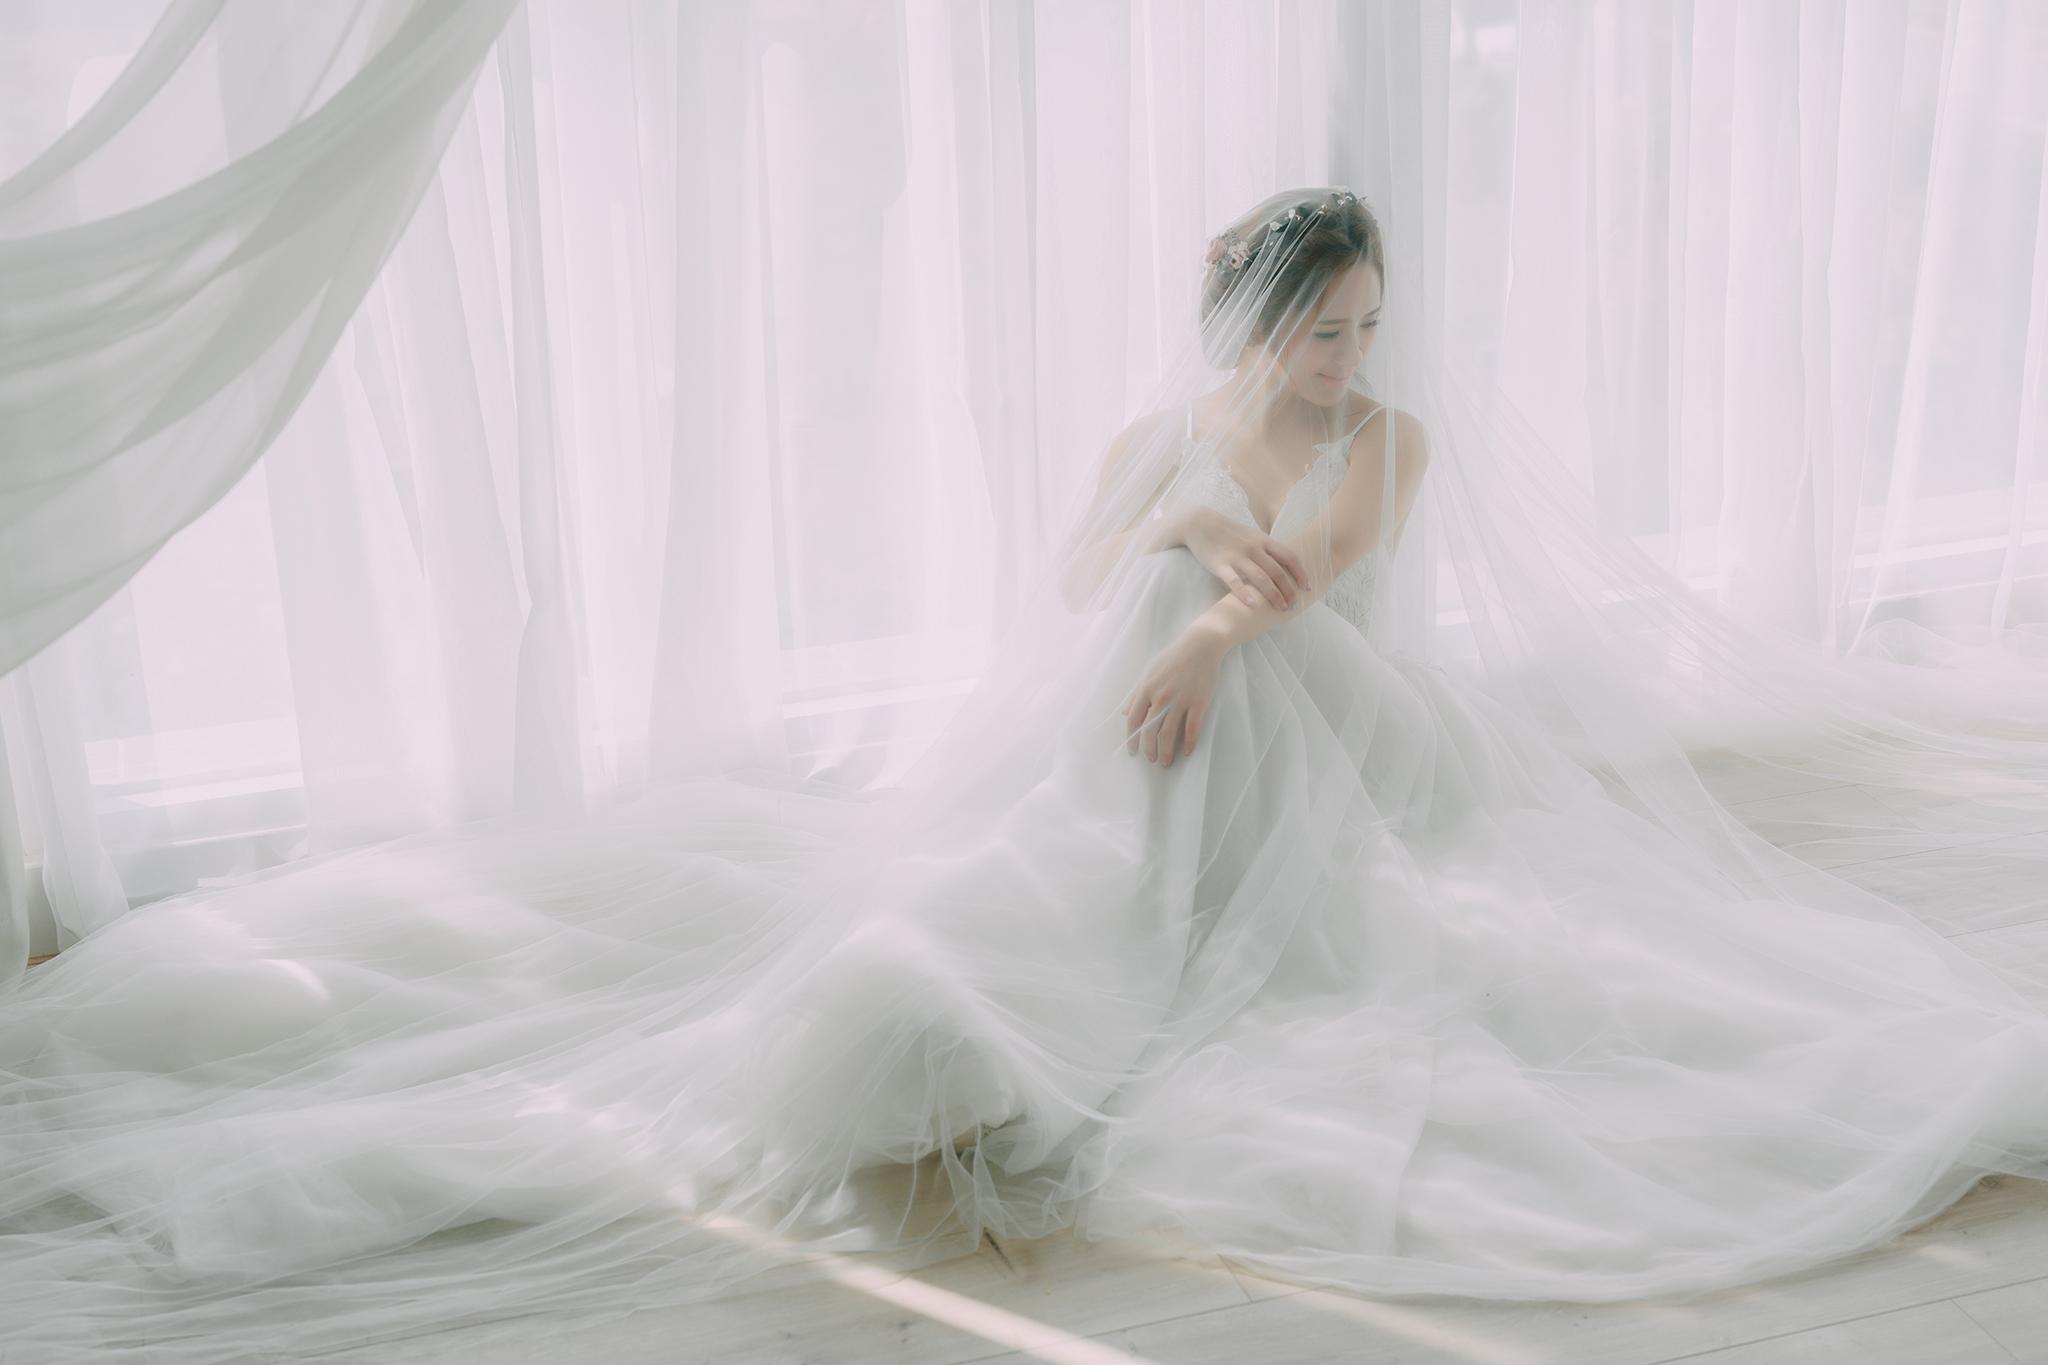 46178836655 ff08edc3ea o - 【自助婚紗】+至宏&如蕙+